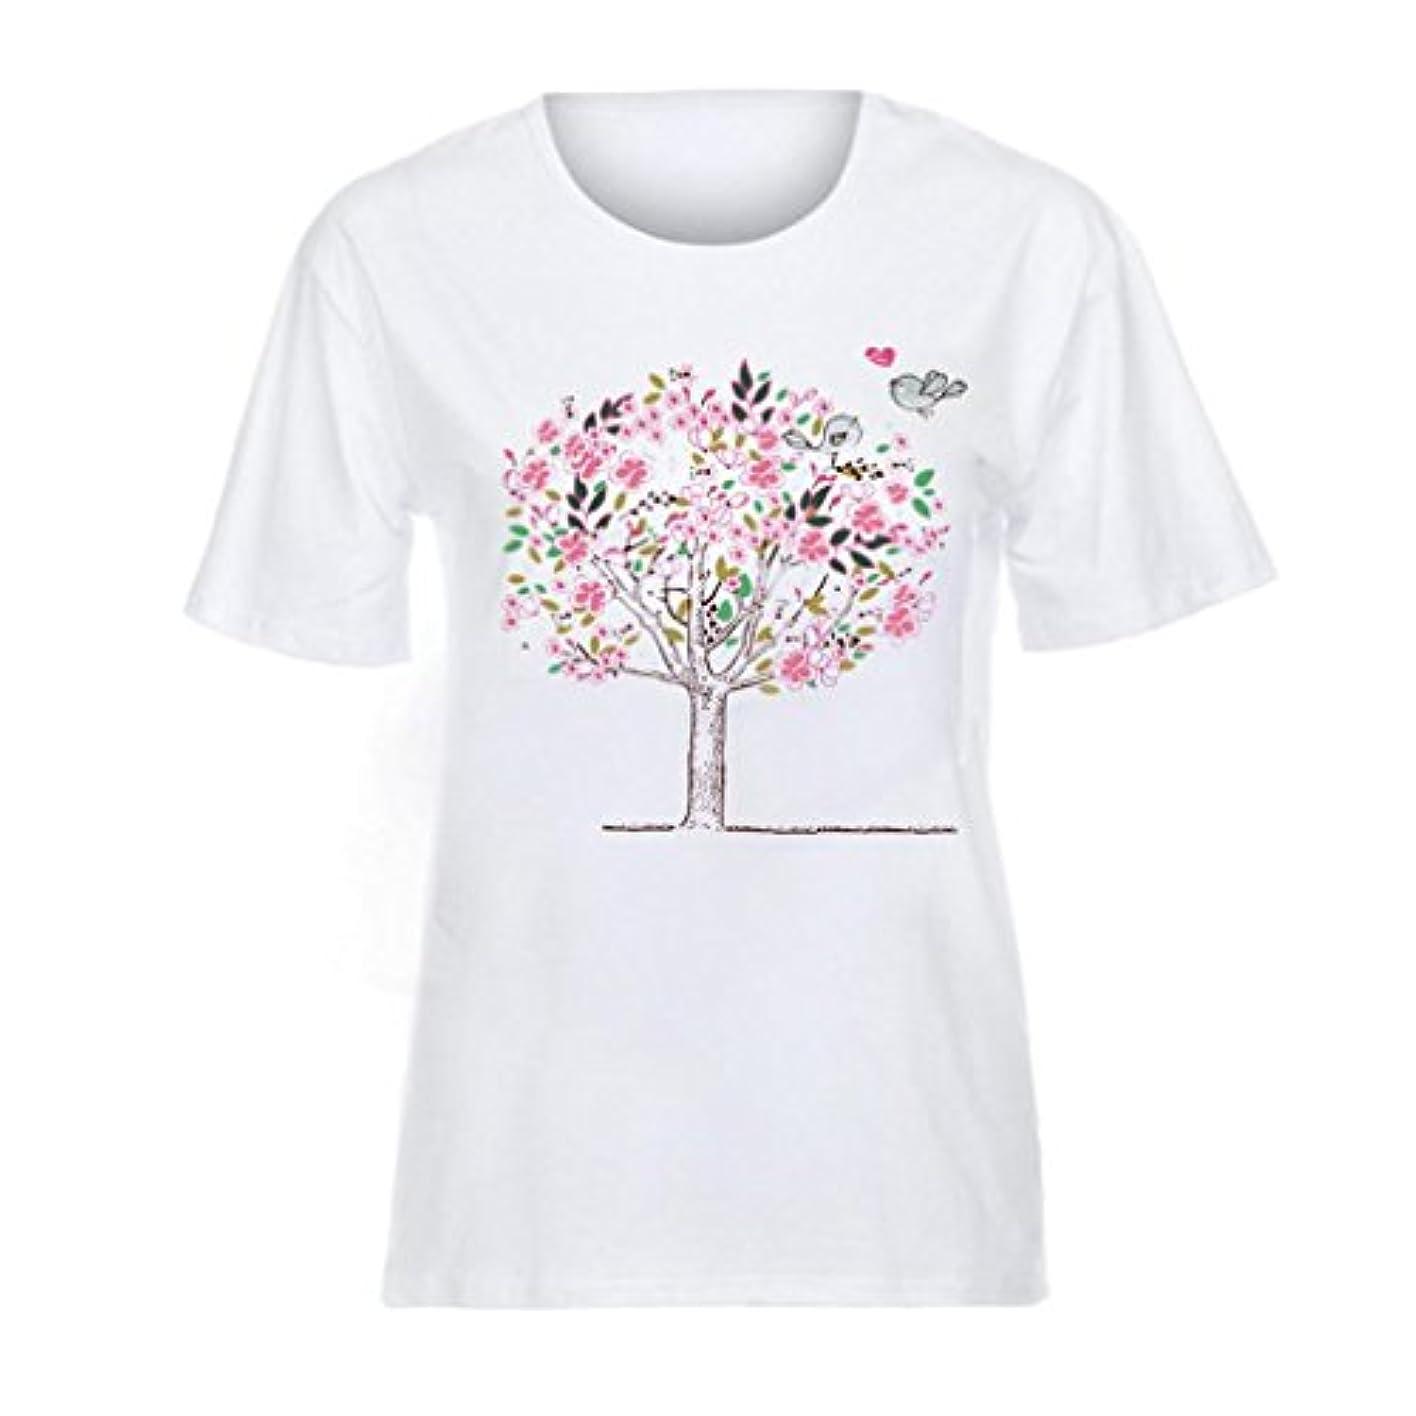 SakuraBest 女性ショートスリーブツリープリントトップスカジュアルルーズホワイトTシャツ